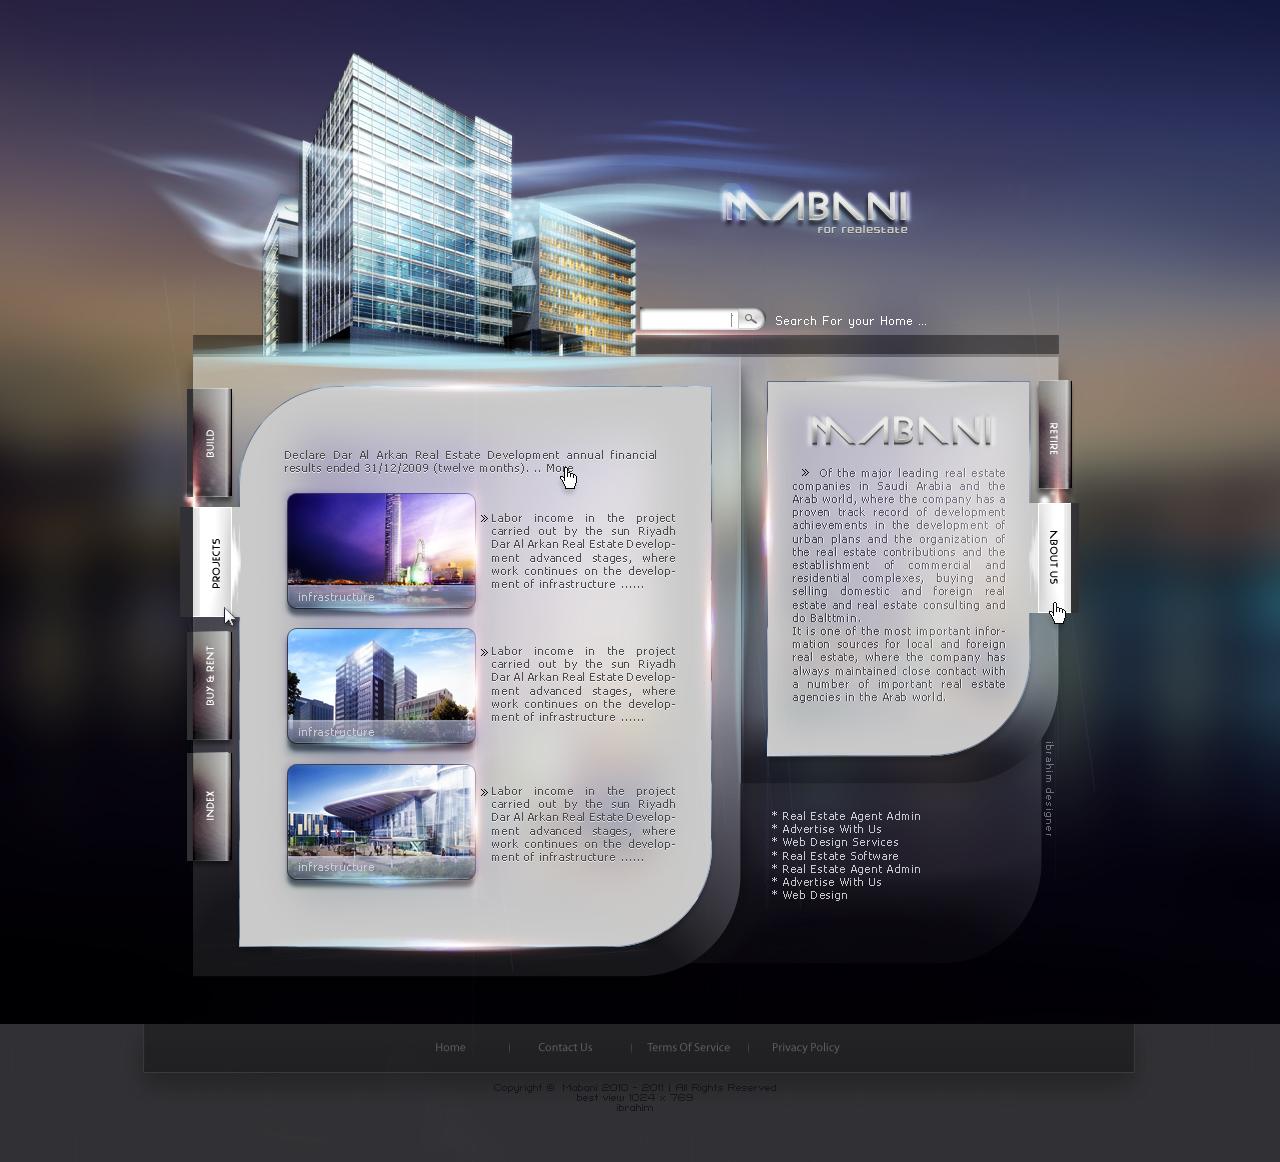 MABANI WEBSITE by ibrahim-ksa